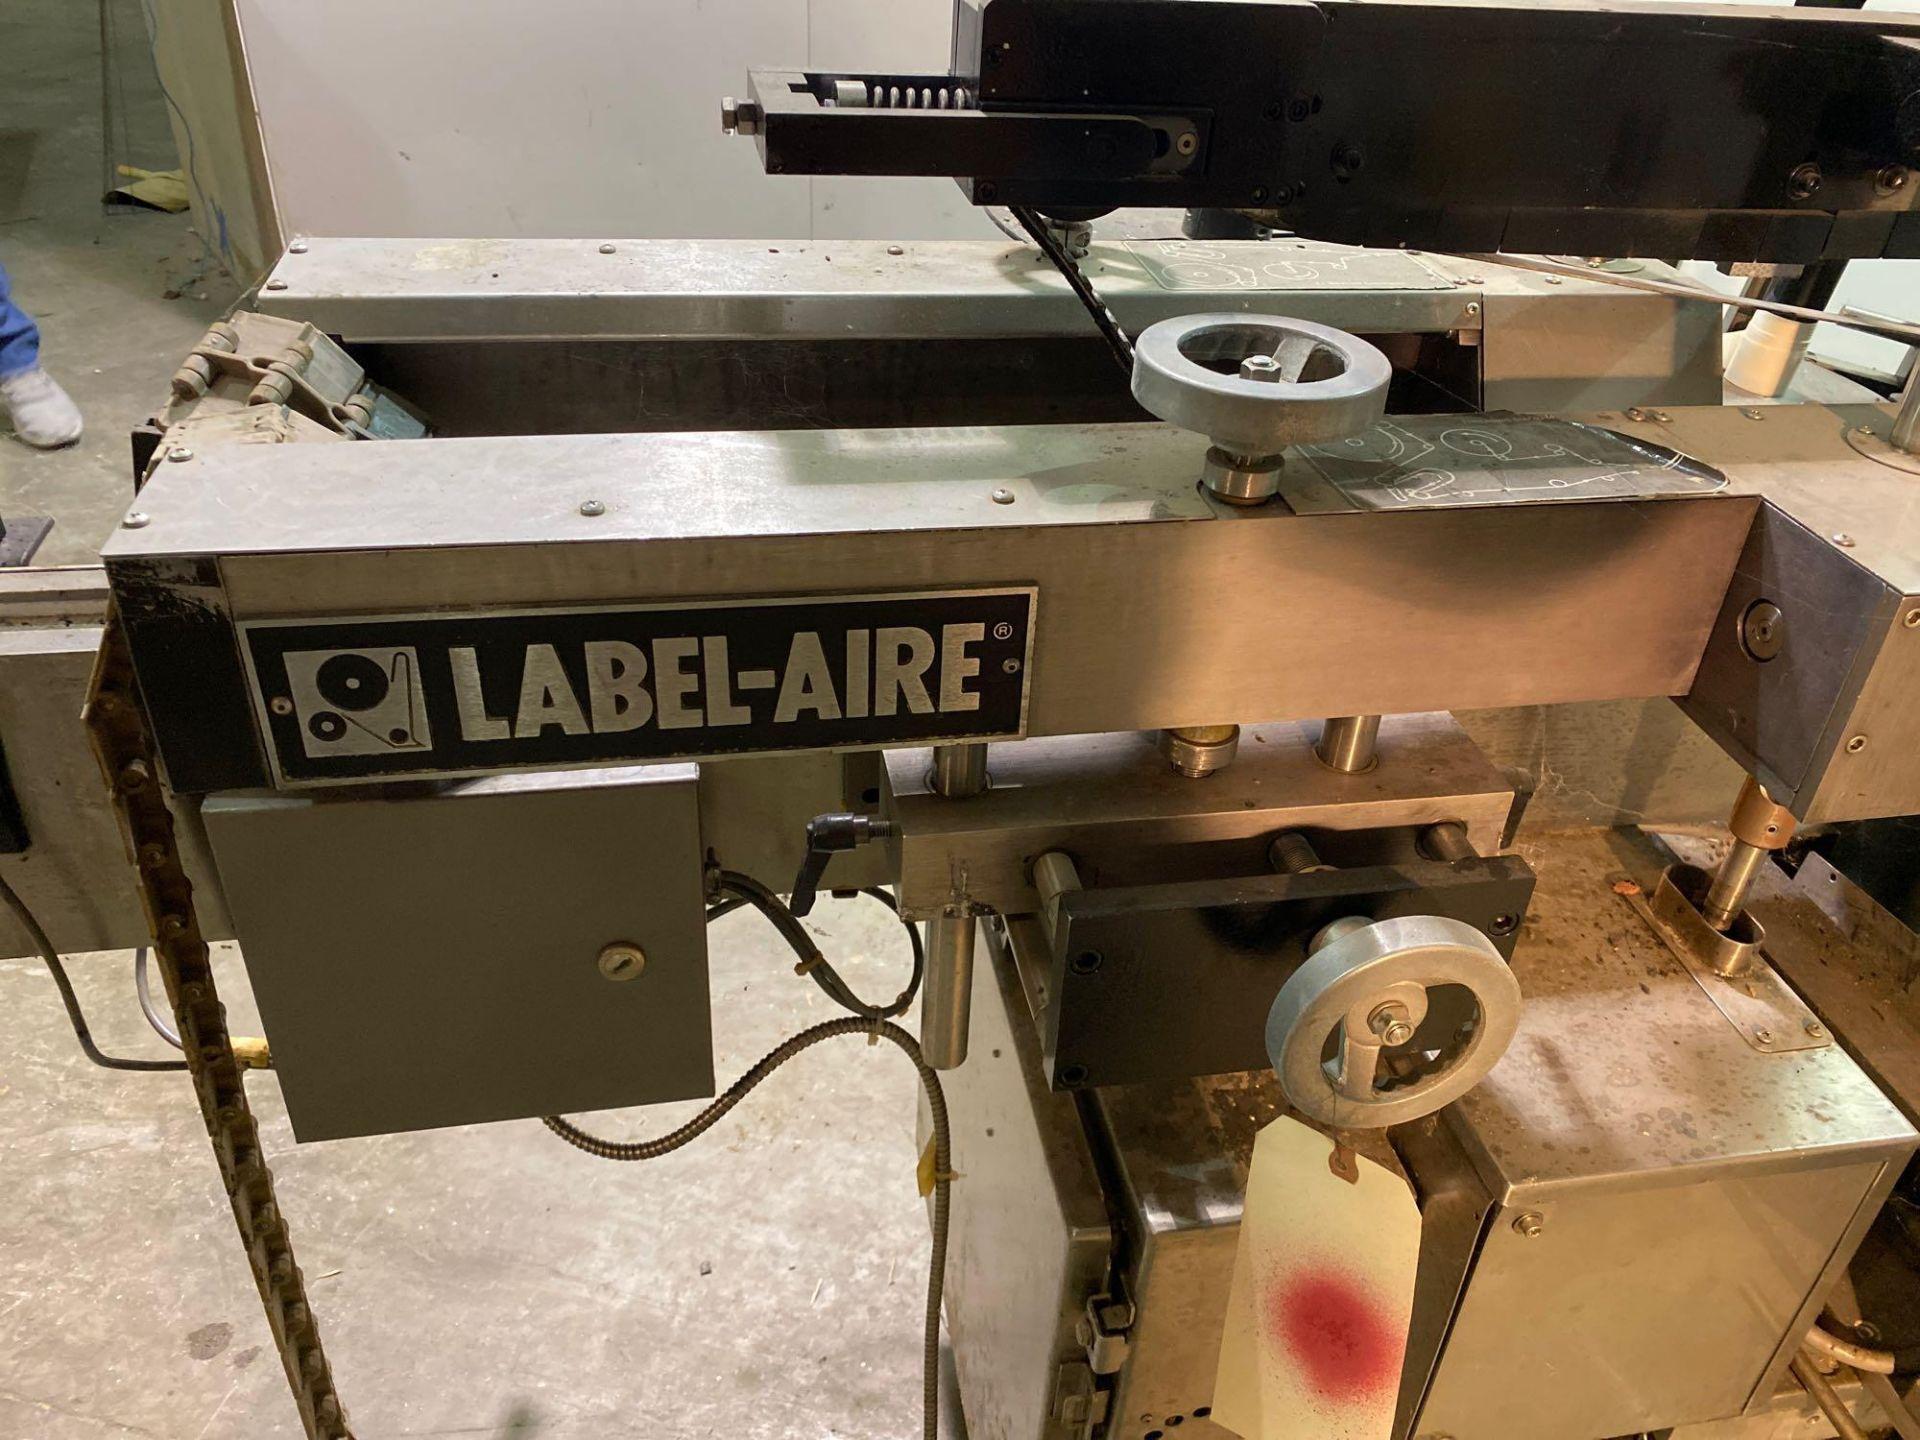 Label-Aire Model 3200 Conveyorized Pressure Sensitive Labeler - Image 3 of 14